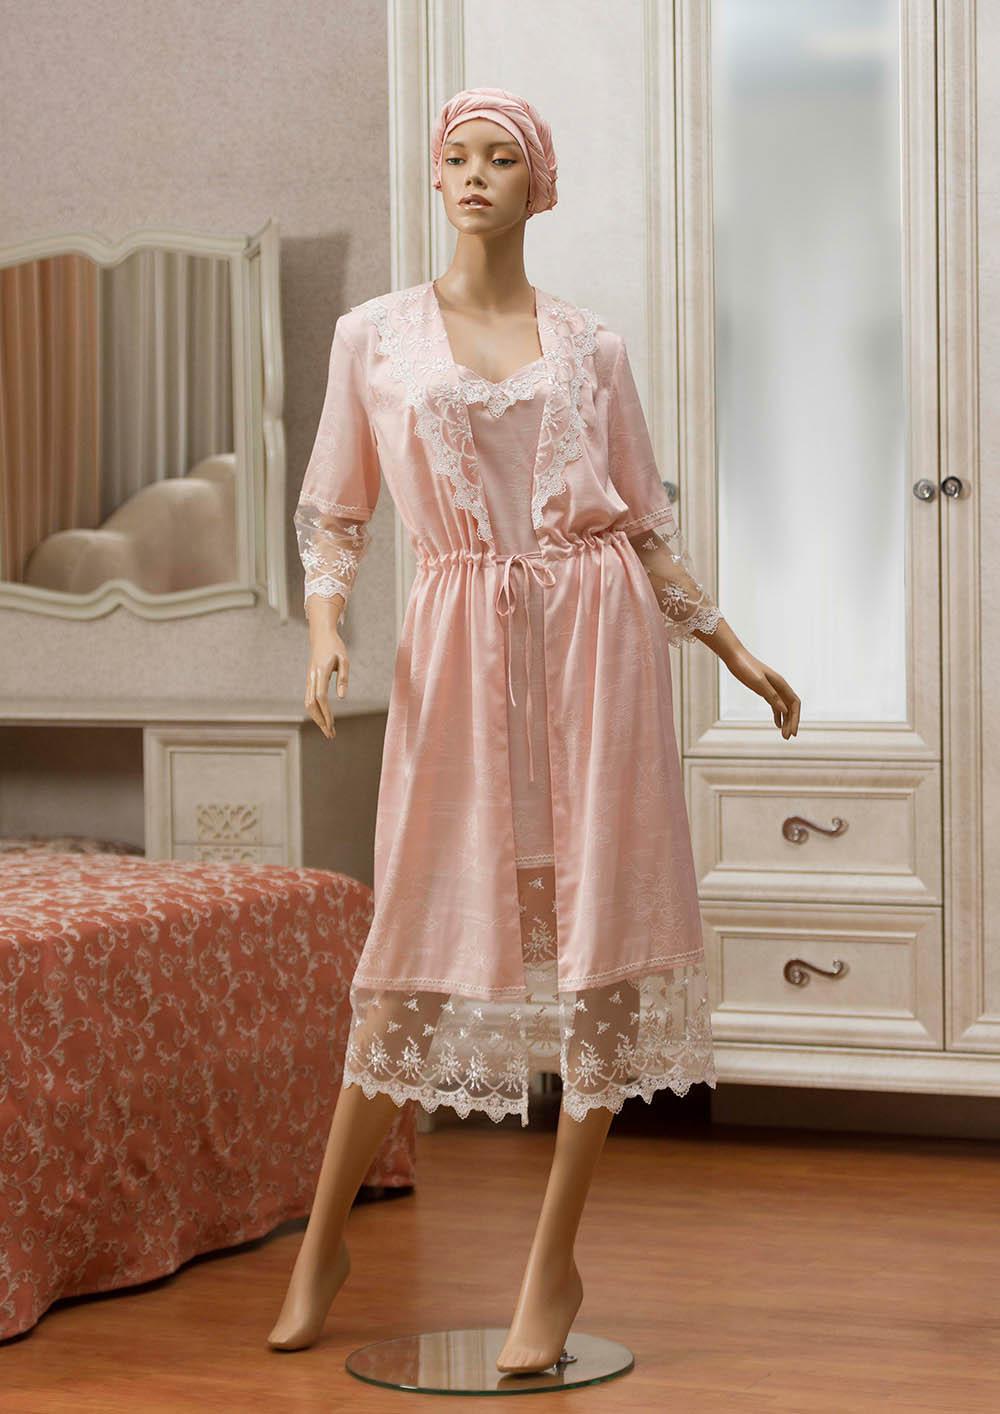 Домашние халаты Primavelle Домашний халат Lavole Цвет: Розовый (L-xL) домашние халаты mia mia домашний халат yesenia xl